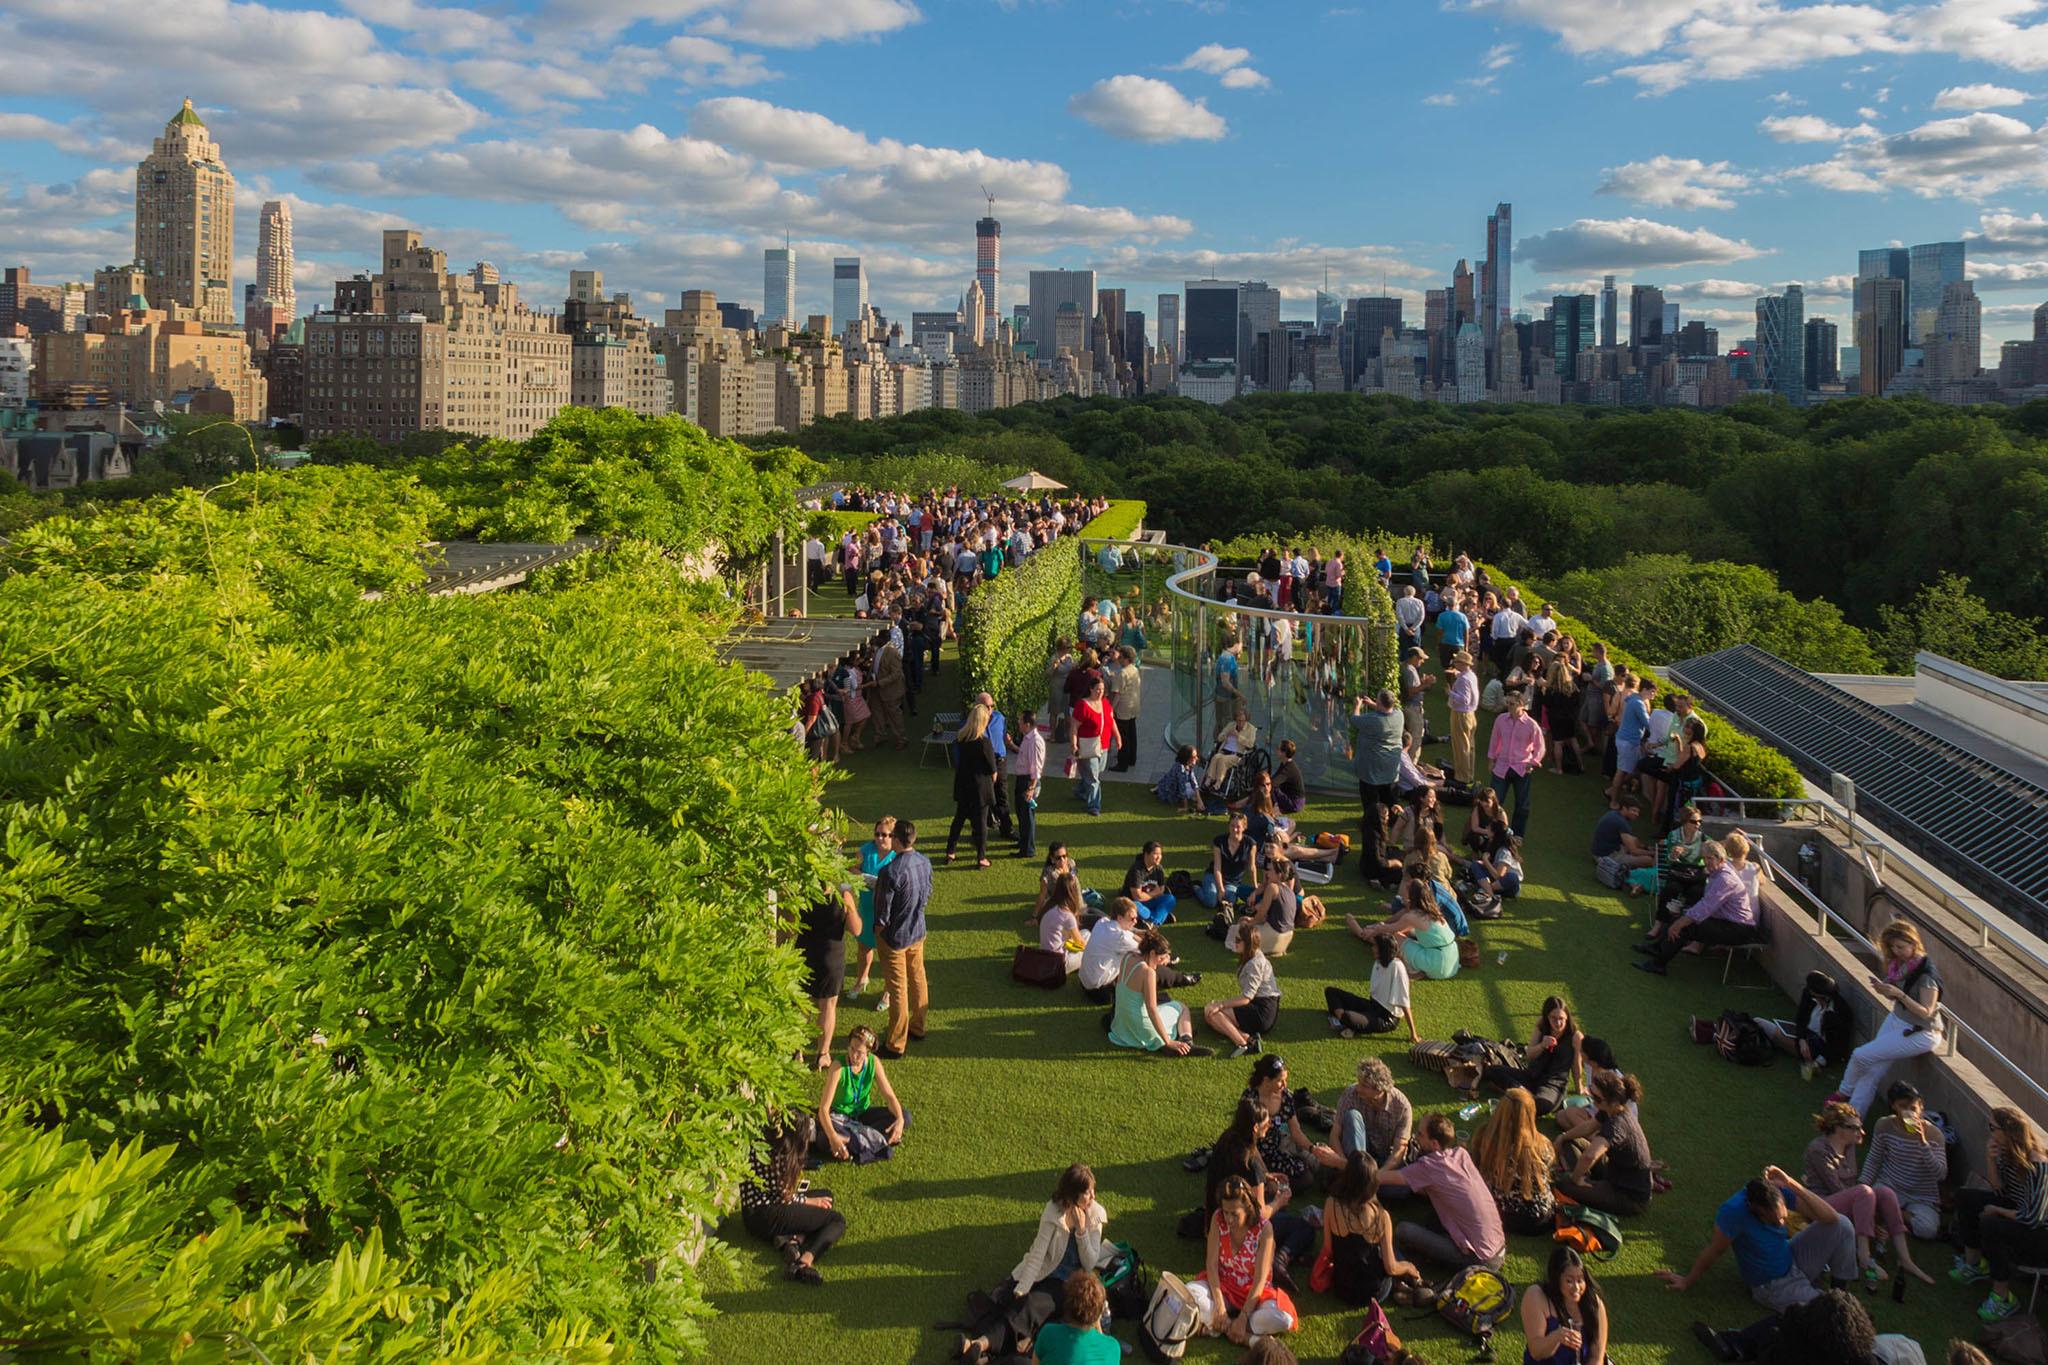 The Metropolitan Museum Of Art rooftop installation will reframe the Manhattan skyline